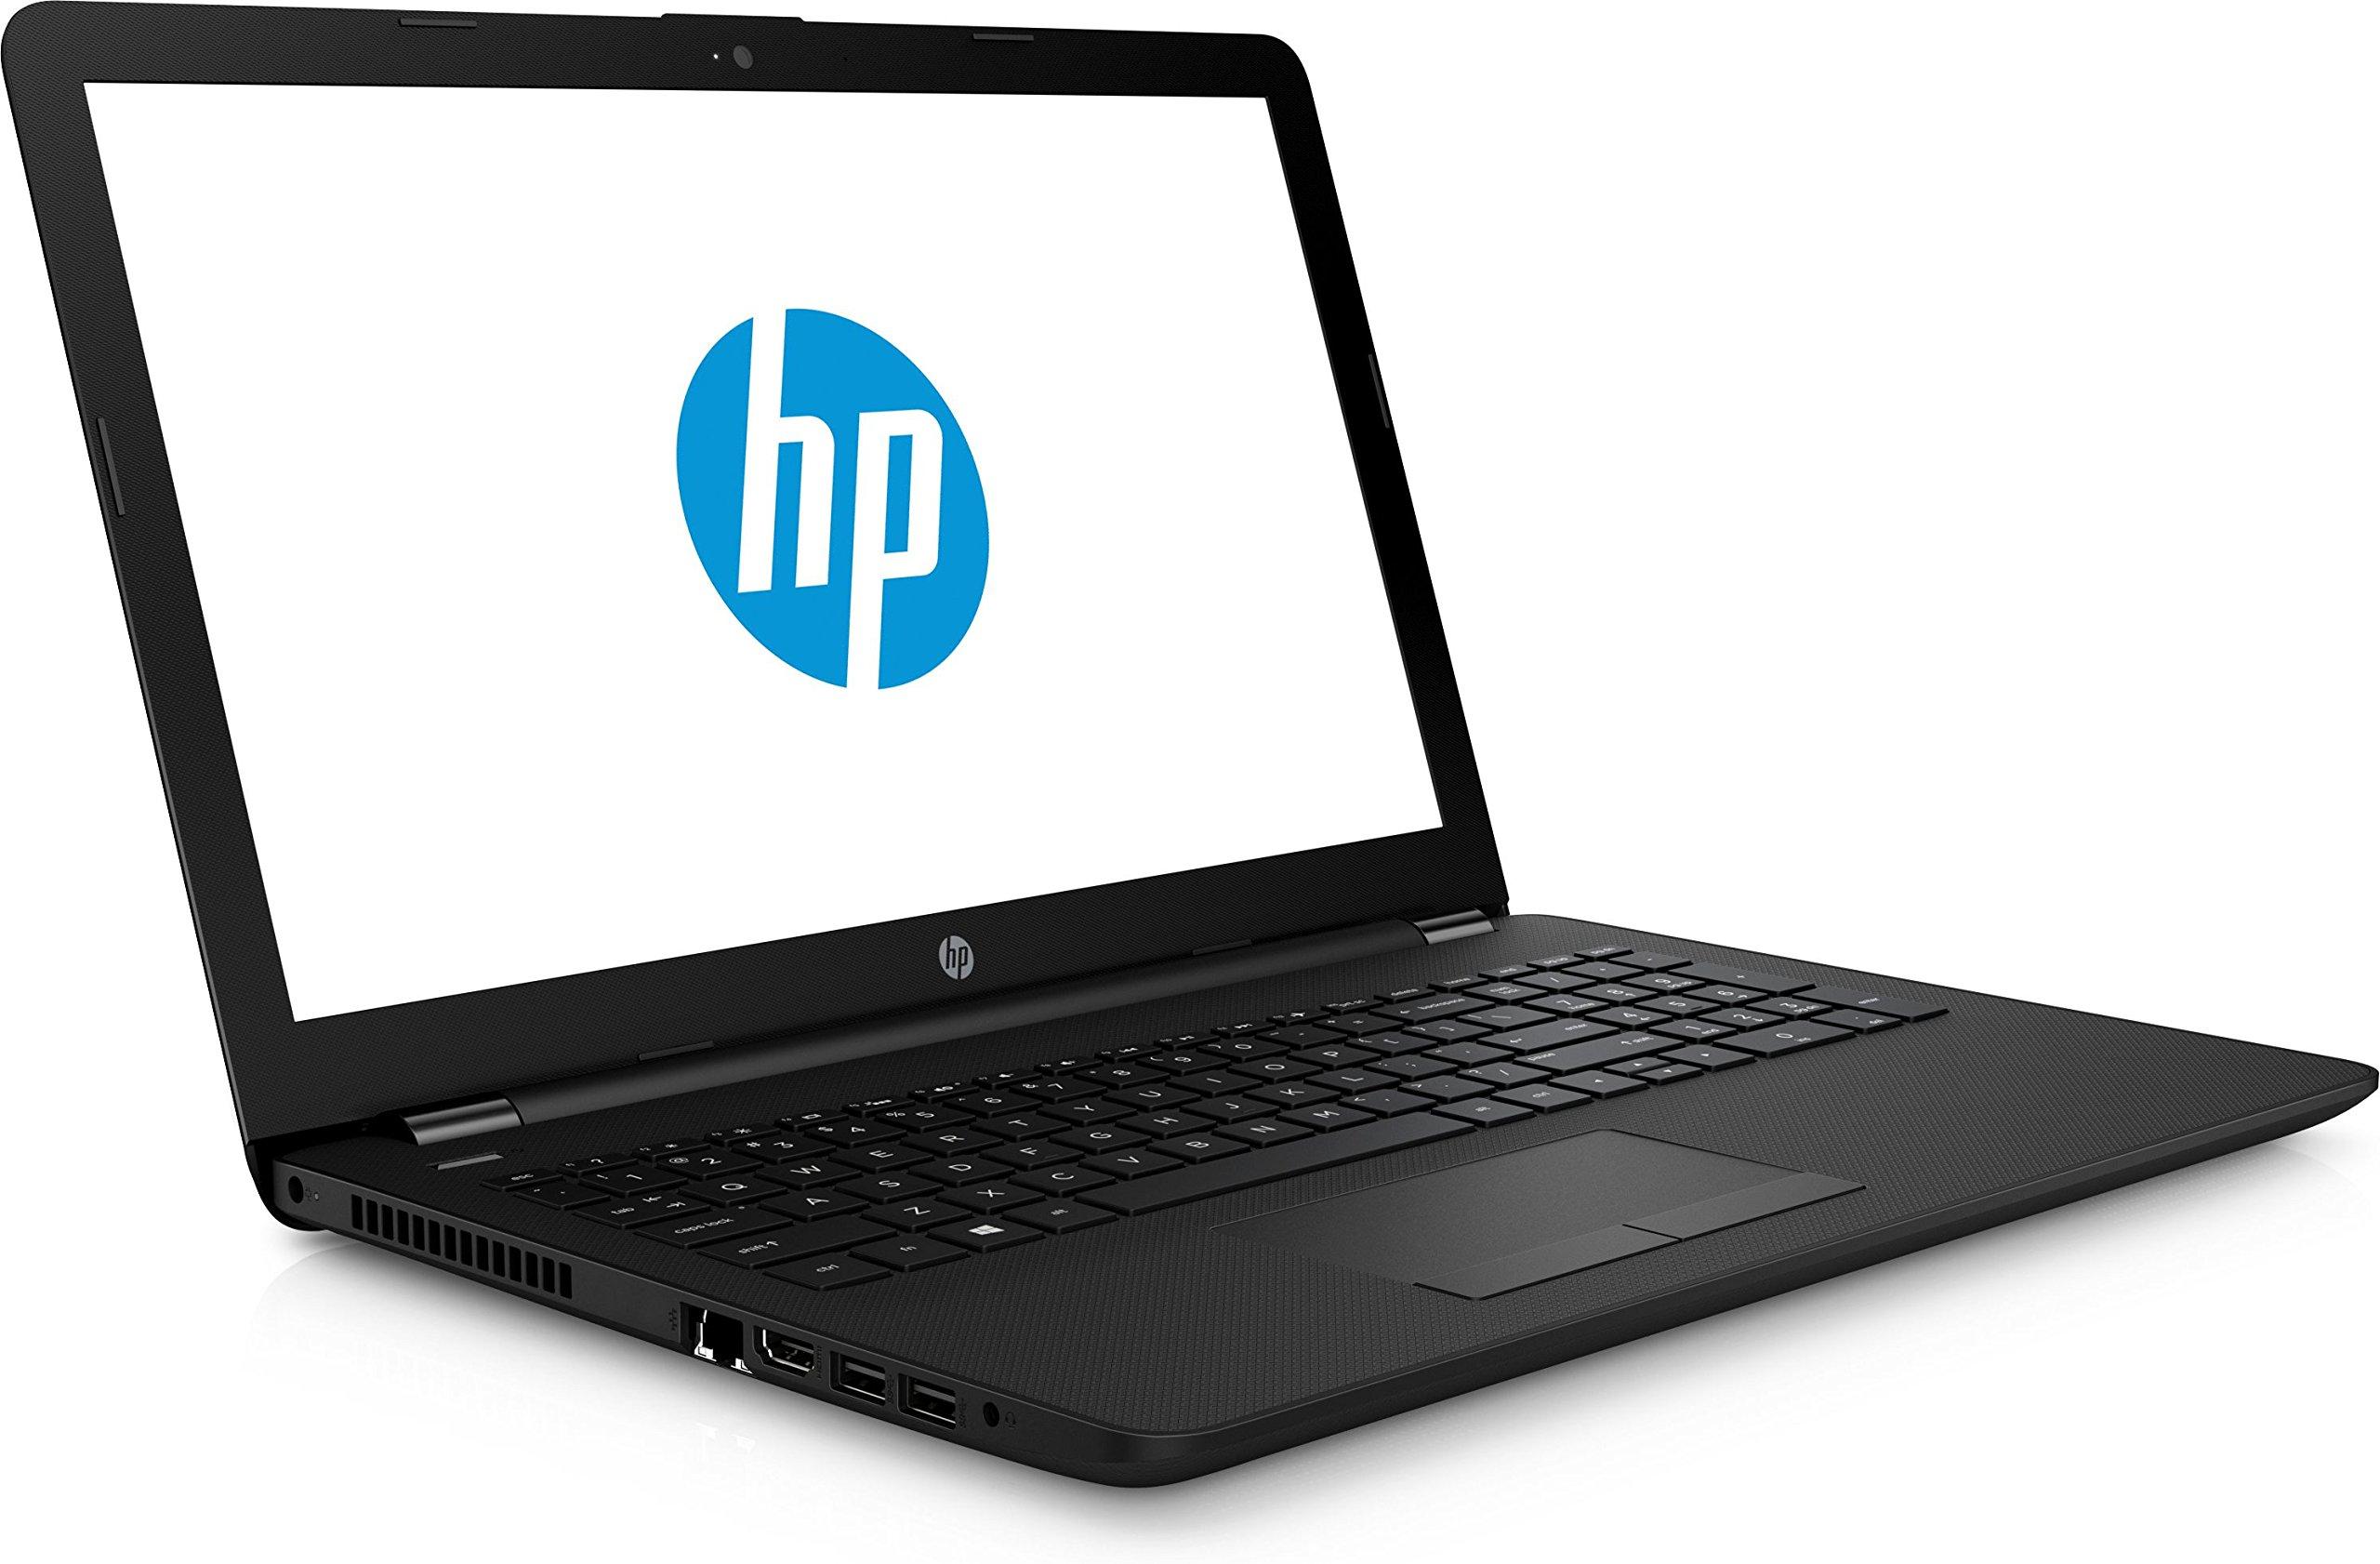 HP 15.6-Inch HD Touchscreen Laptop (Intel Quad Core Pentium N3710 1.6GHz, 4GB DDR3L-1600 Memory, 500 GB HDD, DVD Burner, HDMI, HD Webcam, Win 10) by HP